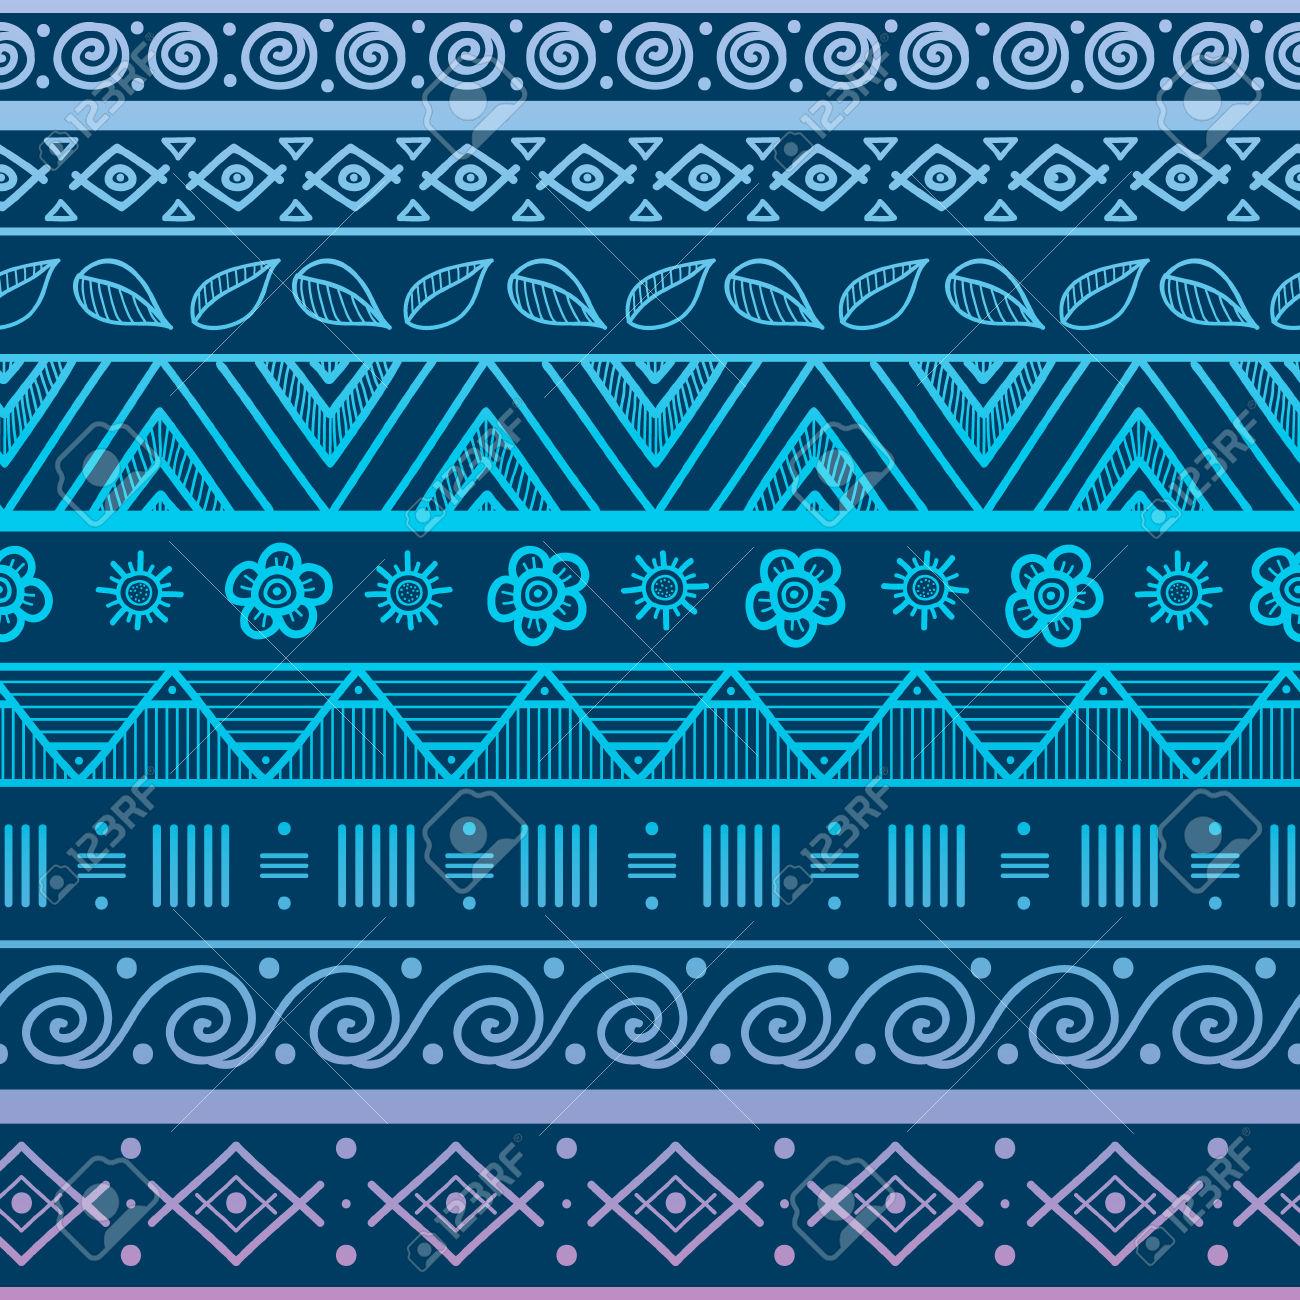 Aztec Patterns Background wwwpixsharkcom   Images 1300x1300